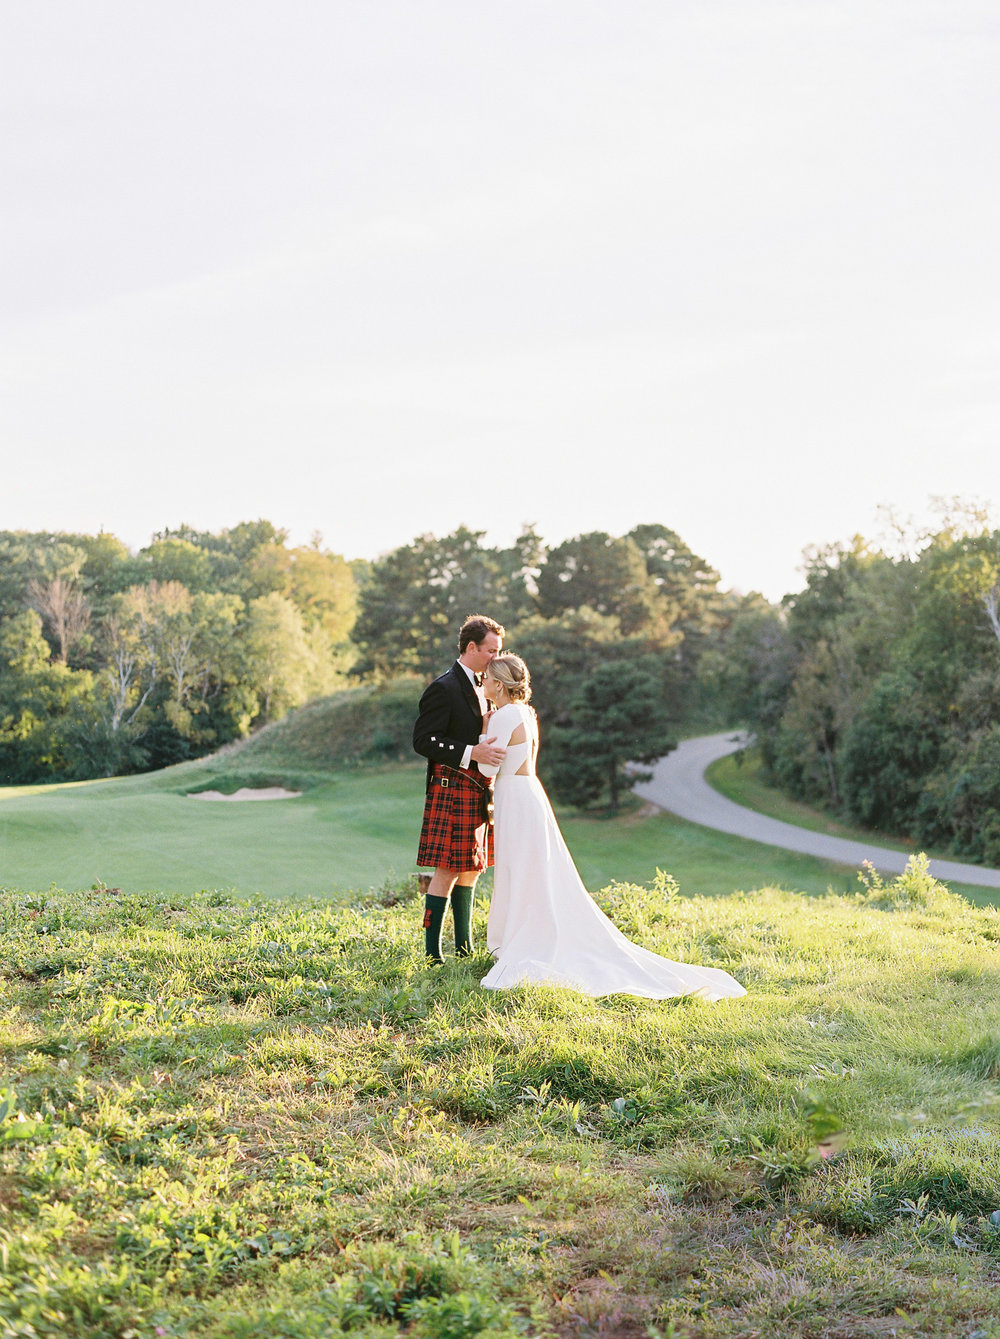 0576-Geneva-Ian-Wedding-Toronto Golf Club-When He Found Her-TorontoPhotographer.jpg